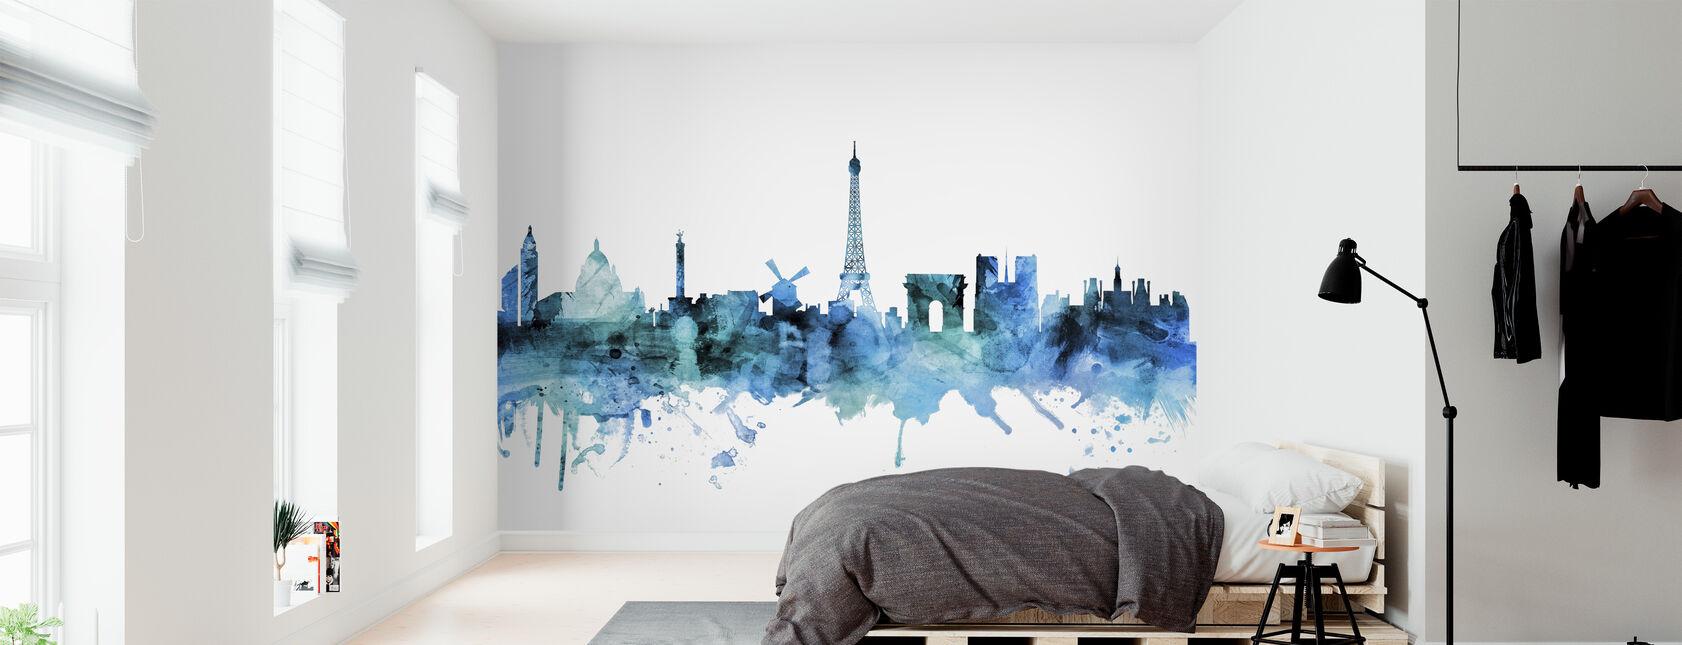 Paris France Skyline - Wallpaper - Bedroom